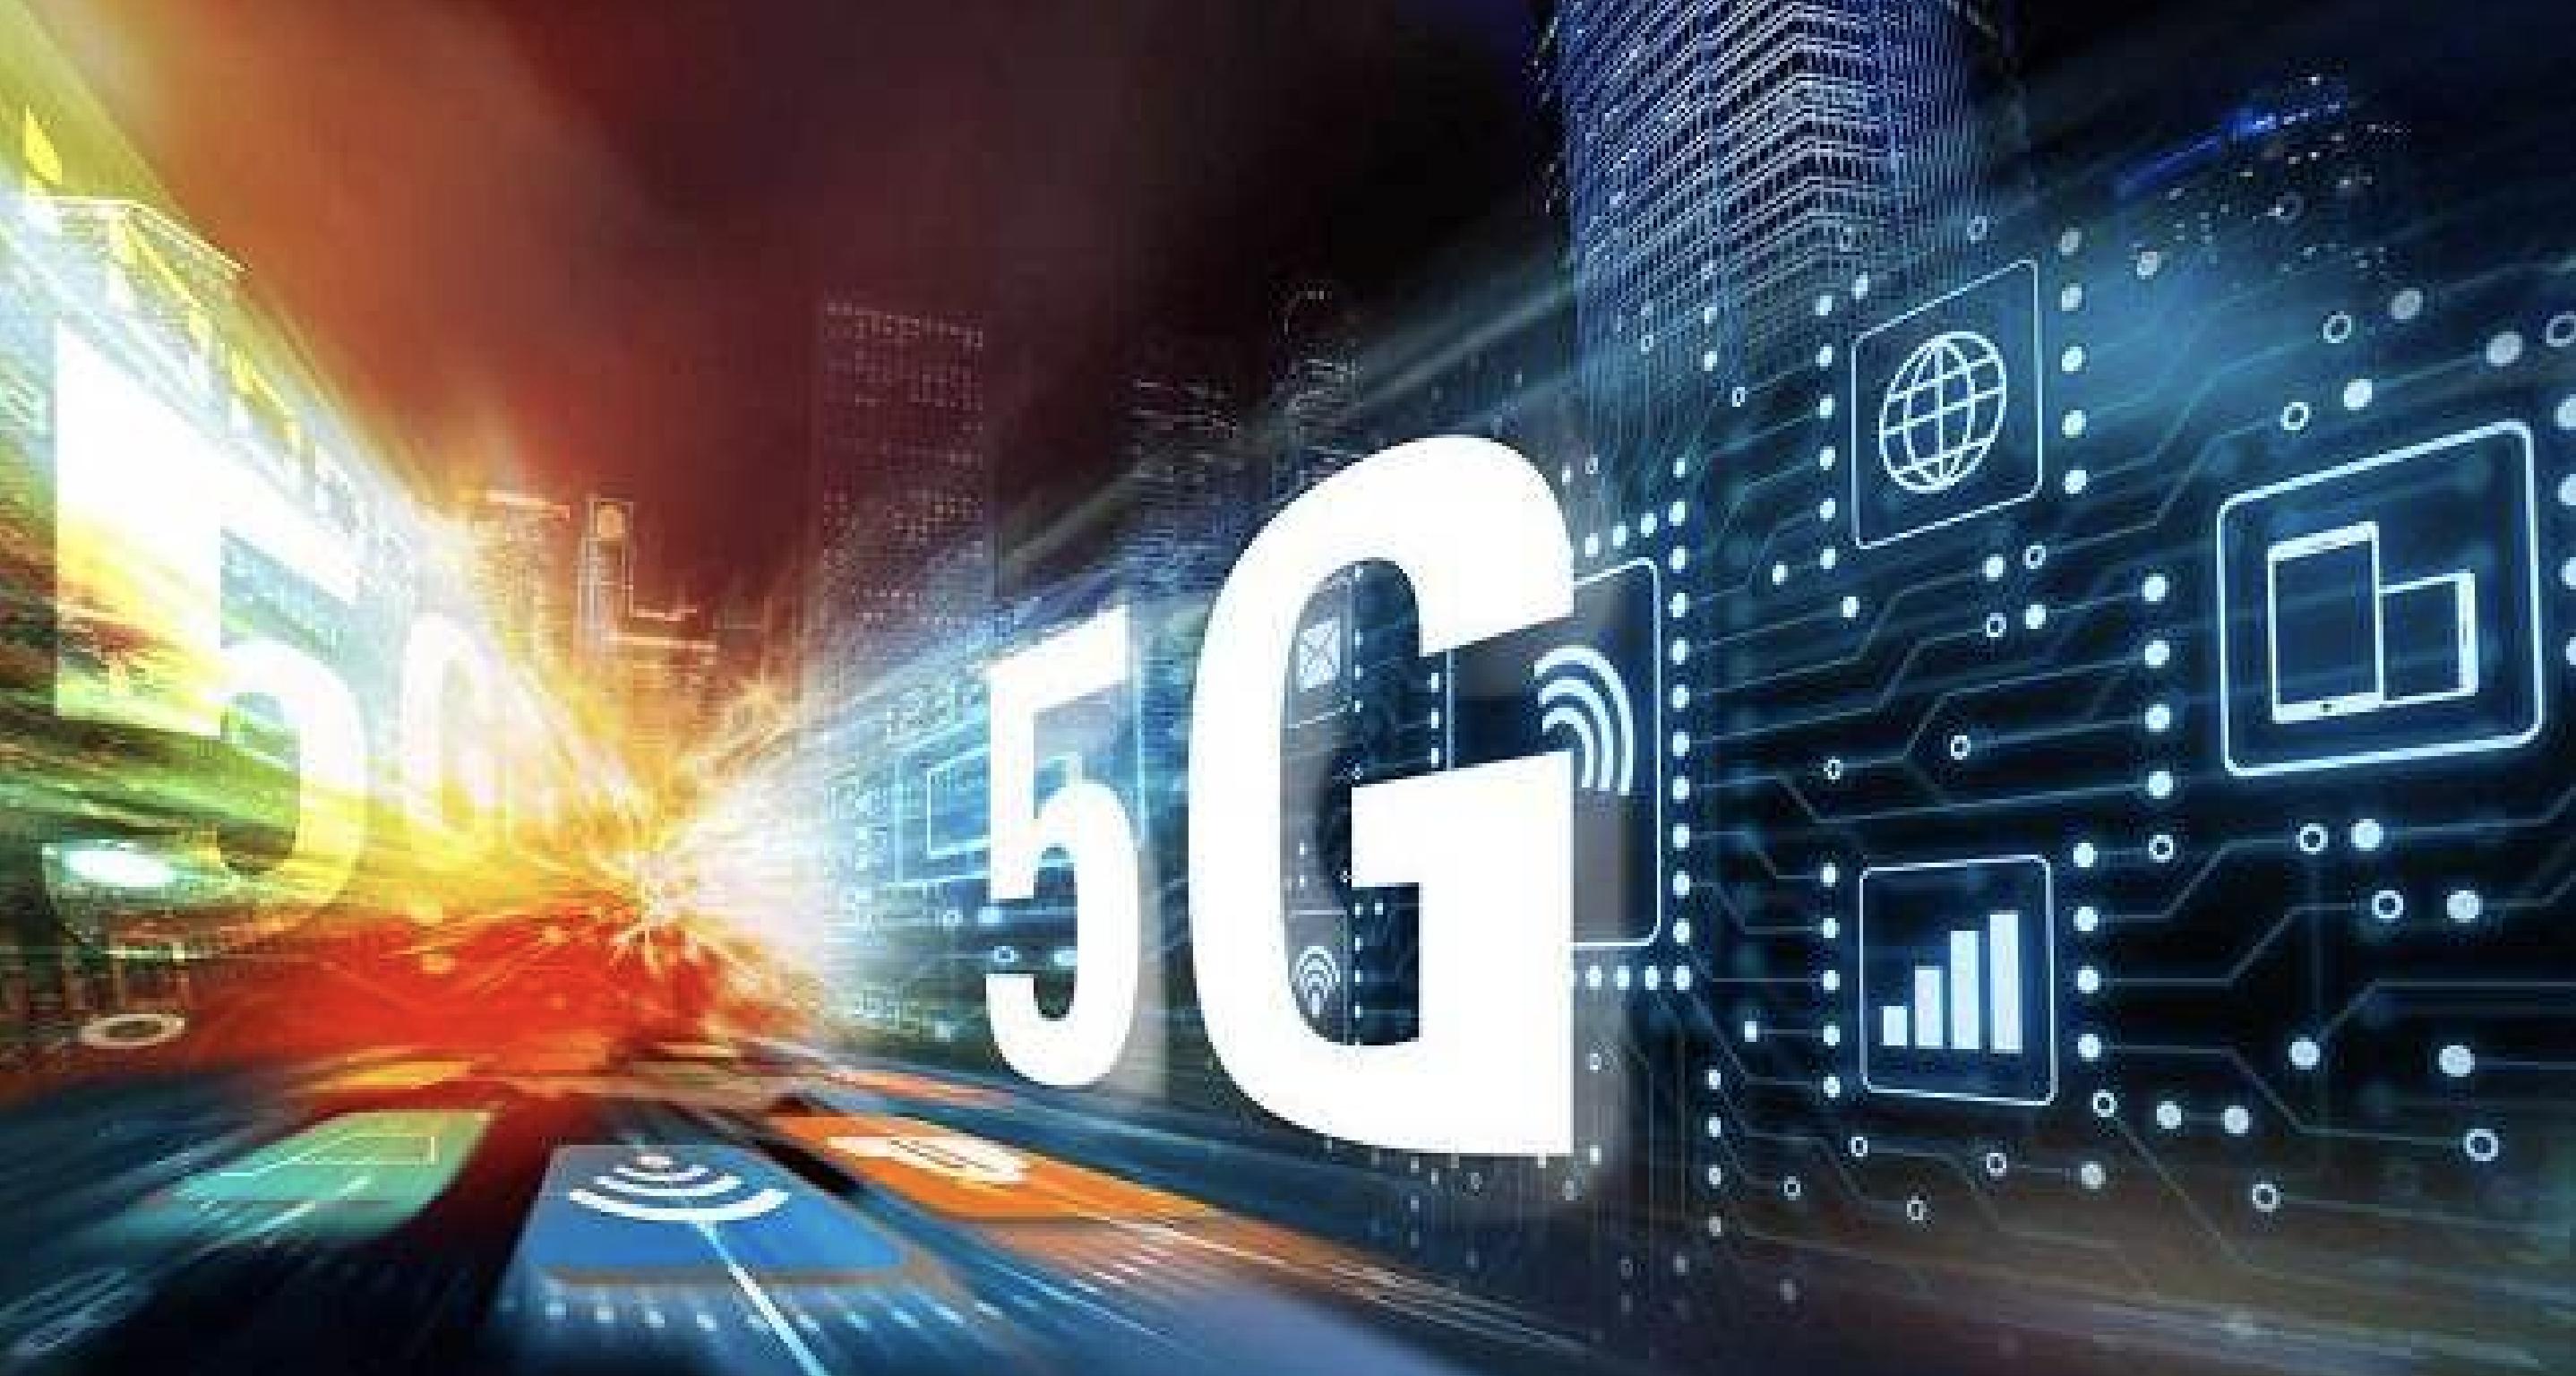 5G商用加速了这五大领域的发展